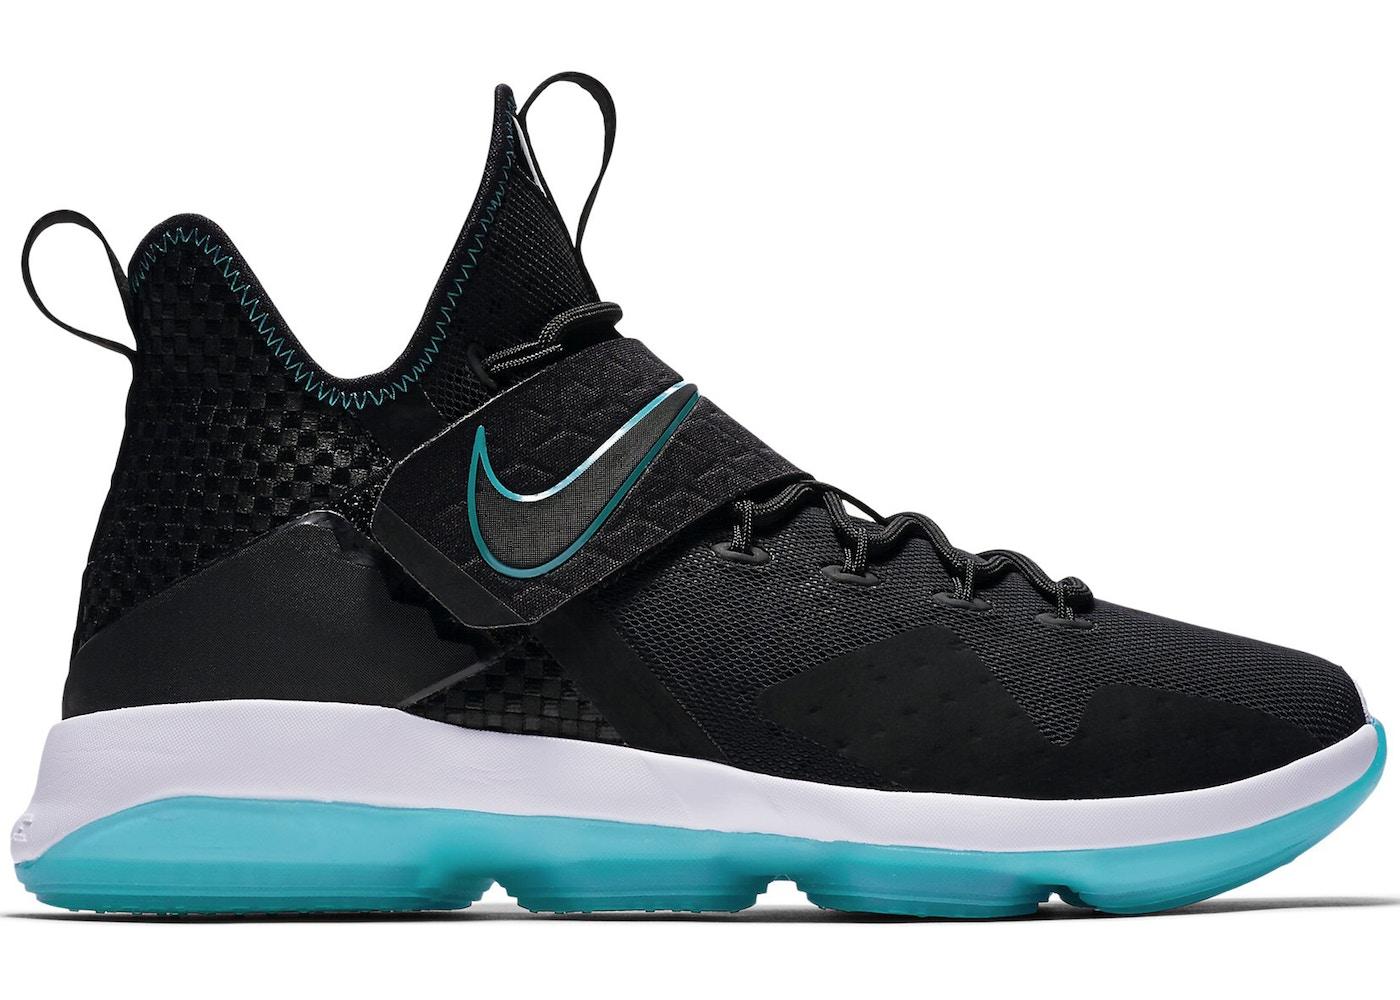 2ca98c0c2ae Nike LeBron 14 Shoes - Last Sale